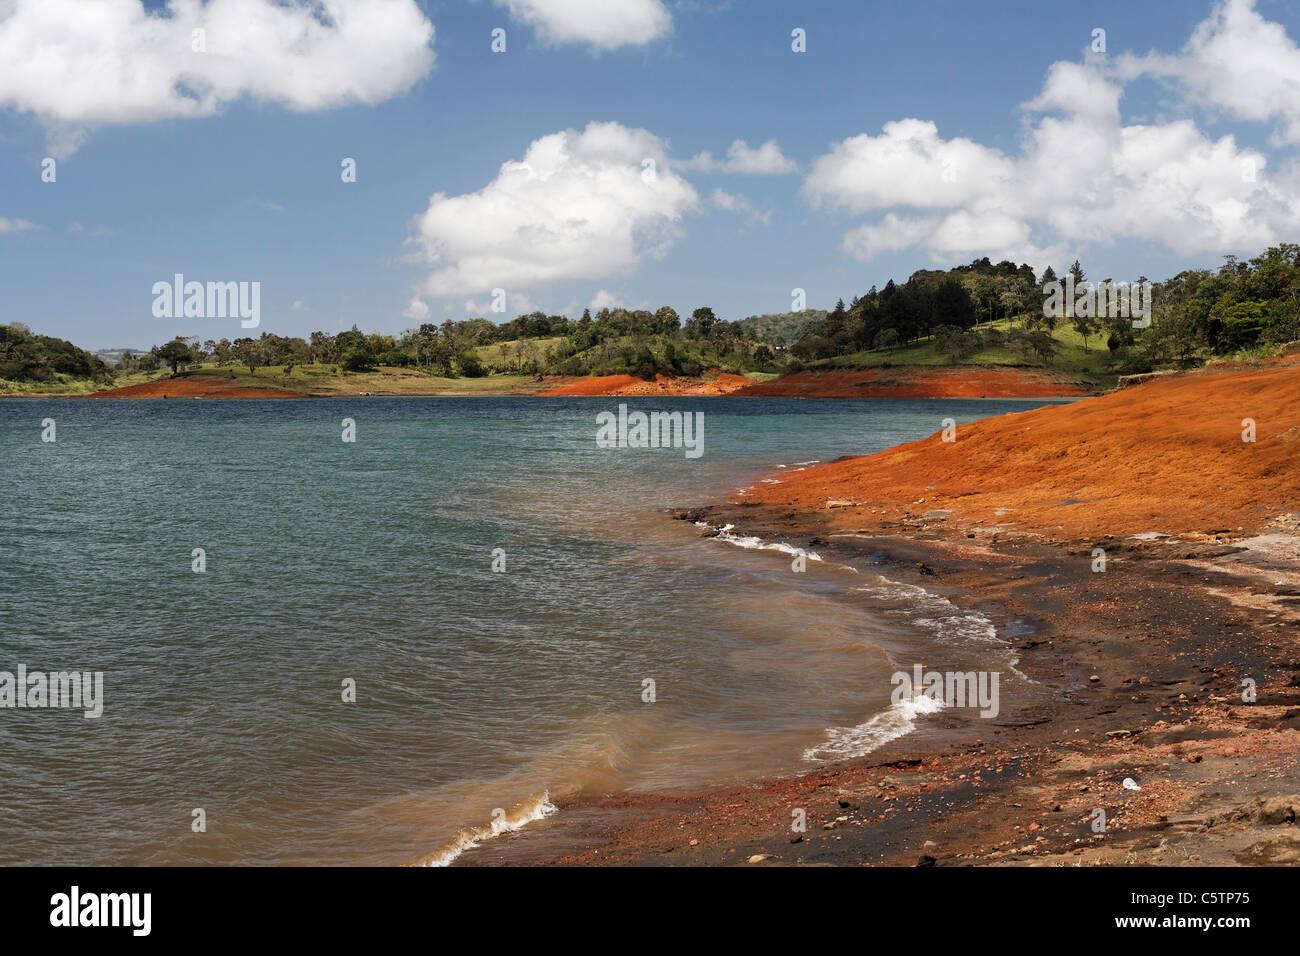 Costa Rica, Laguna de Arenal, View of lake arenal - Stock Image